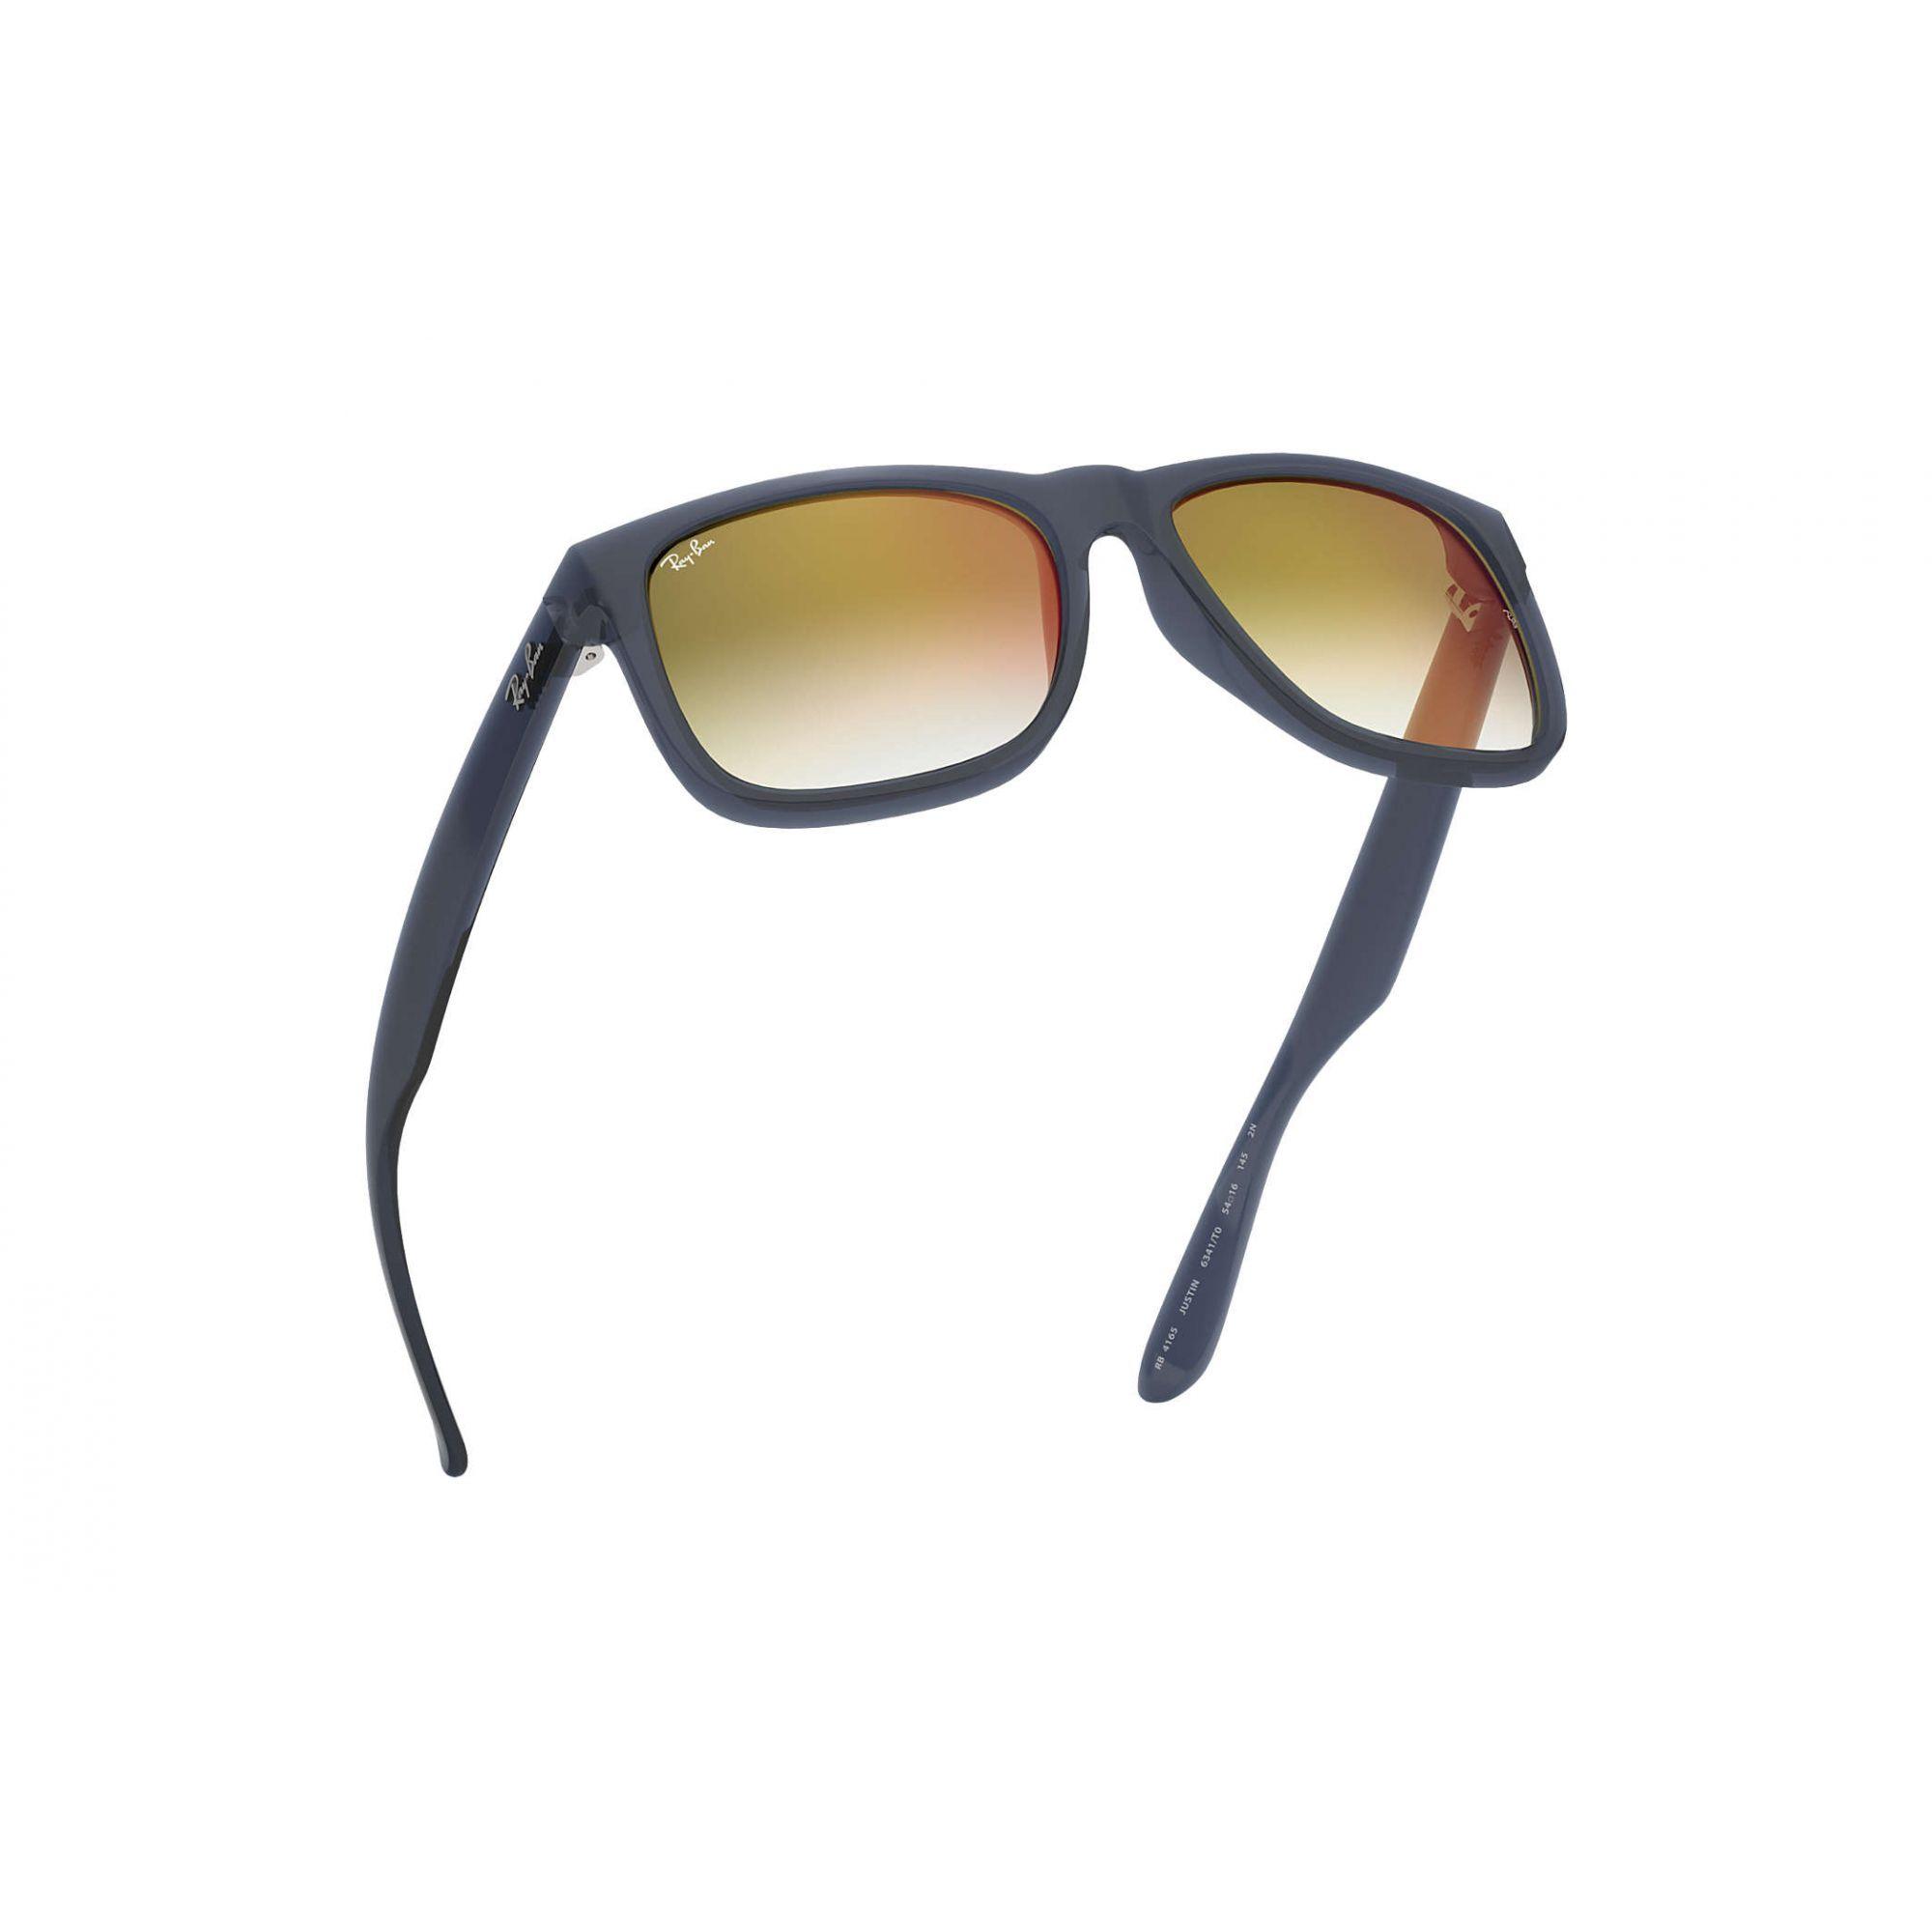 Ray Ban - RB4165 6341T055 - Óculos de sol